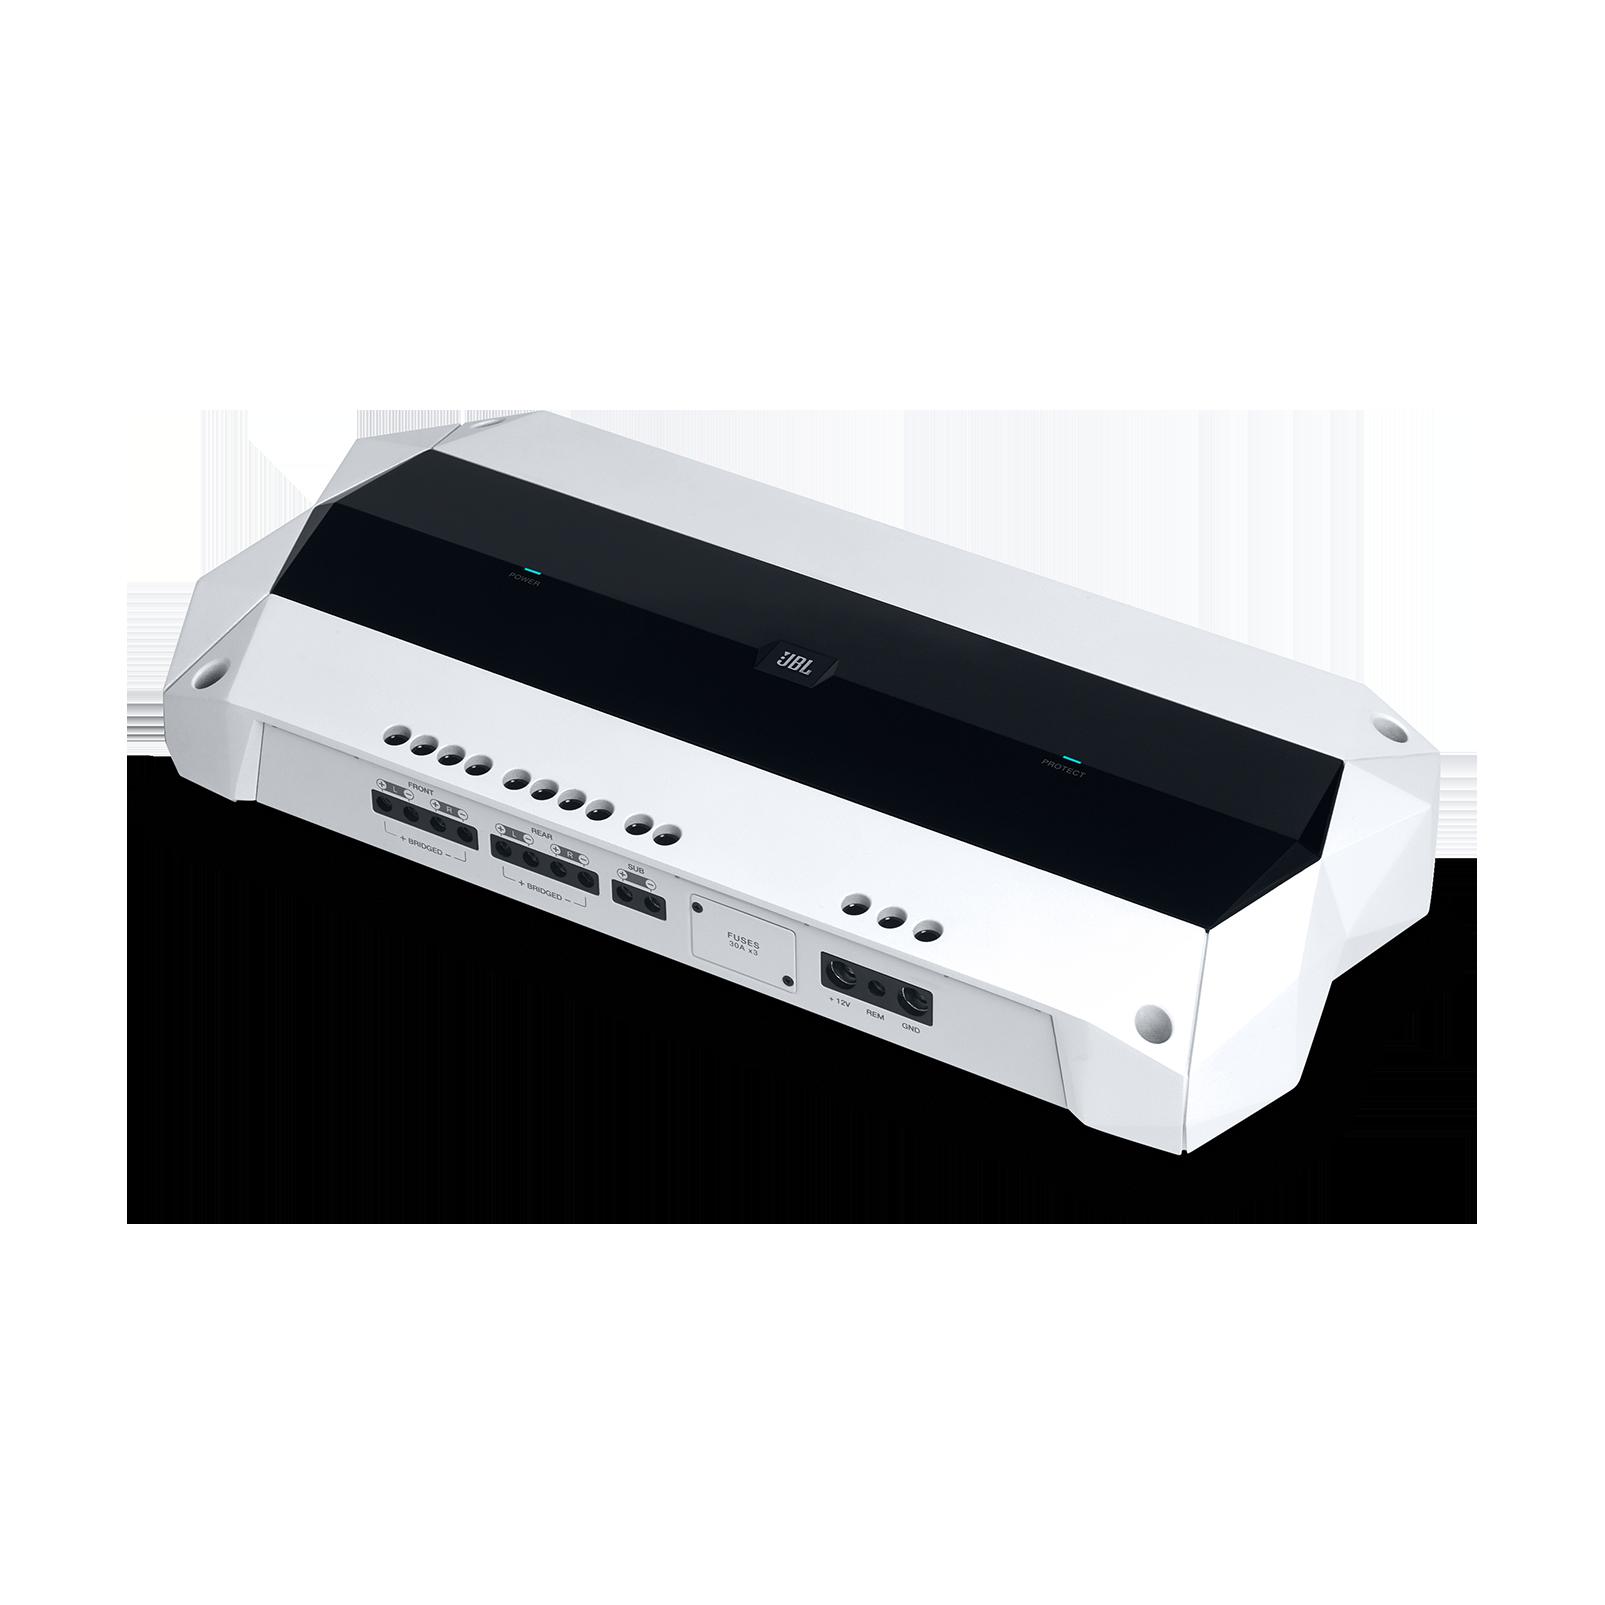 JBL Marine MA4505 - White Matte - Multi-element high-performance, 5-channel amplifier - Hero